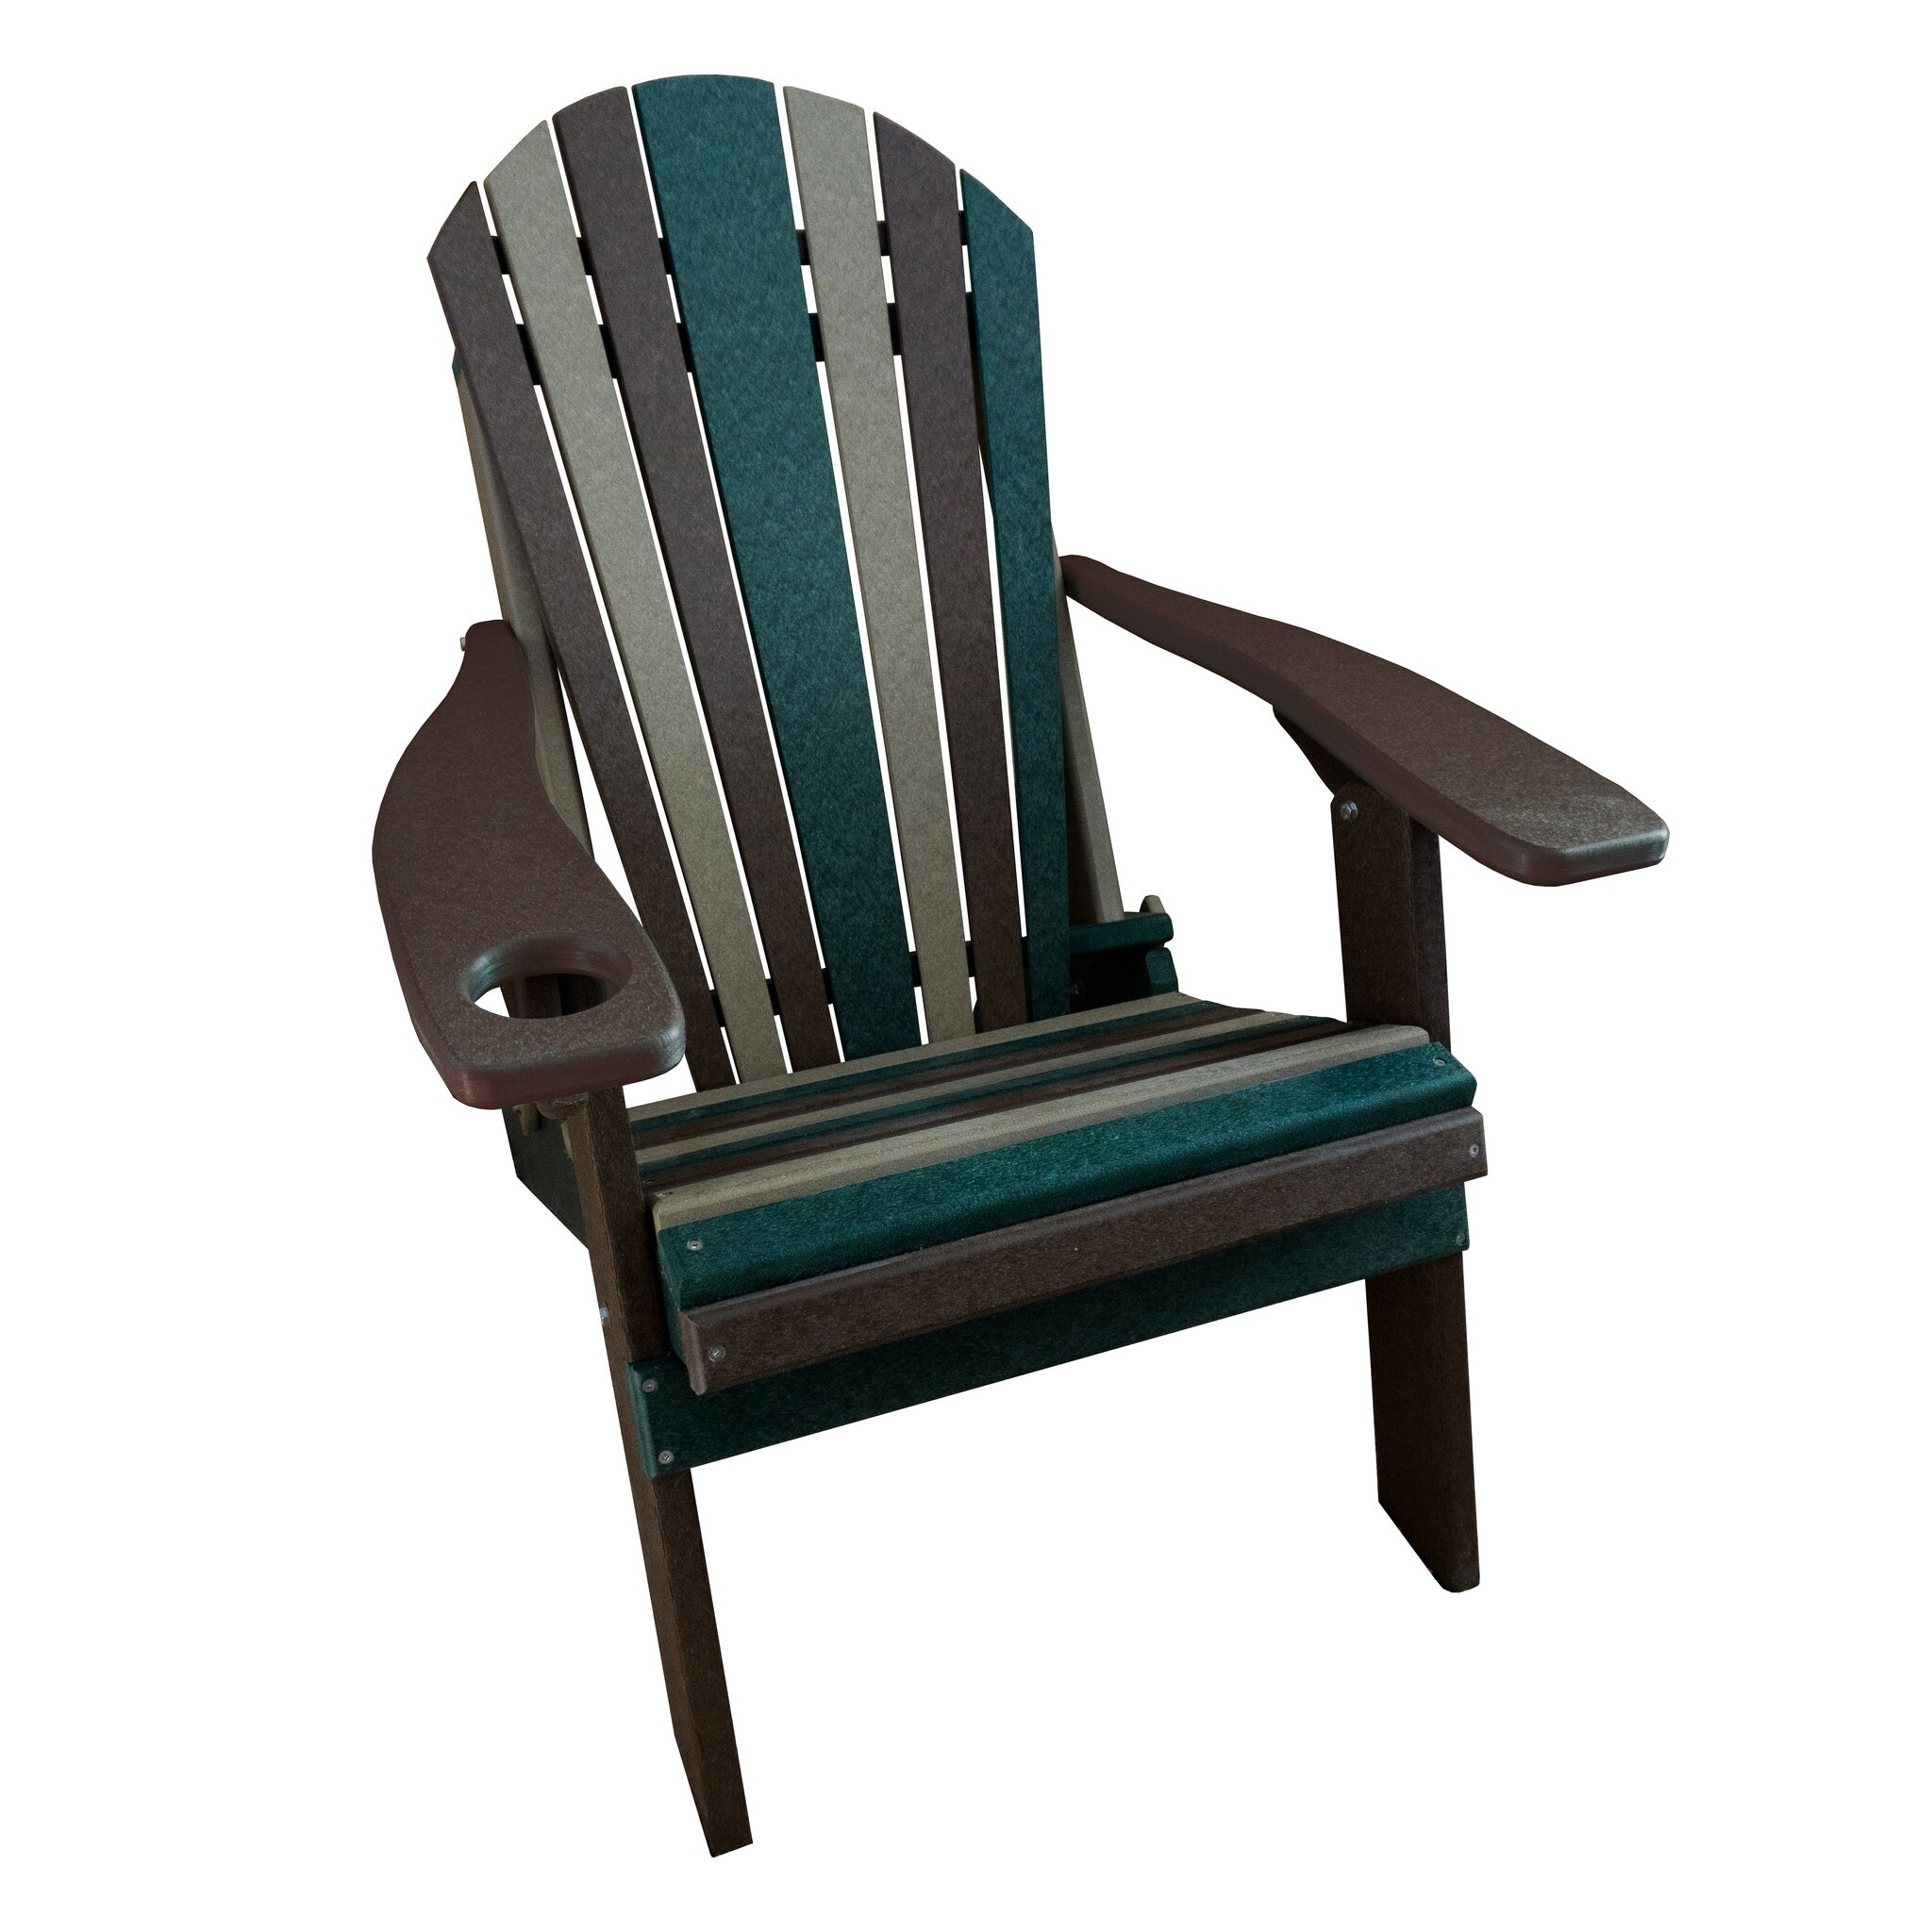 Camo Folding Adirondack Chair 1 Cup Holder Poly Lumber